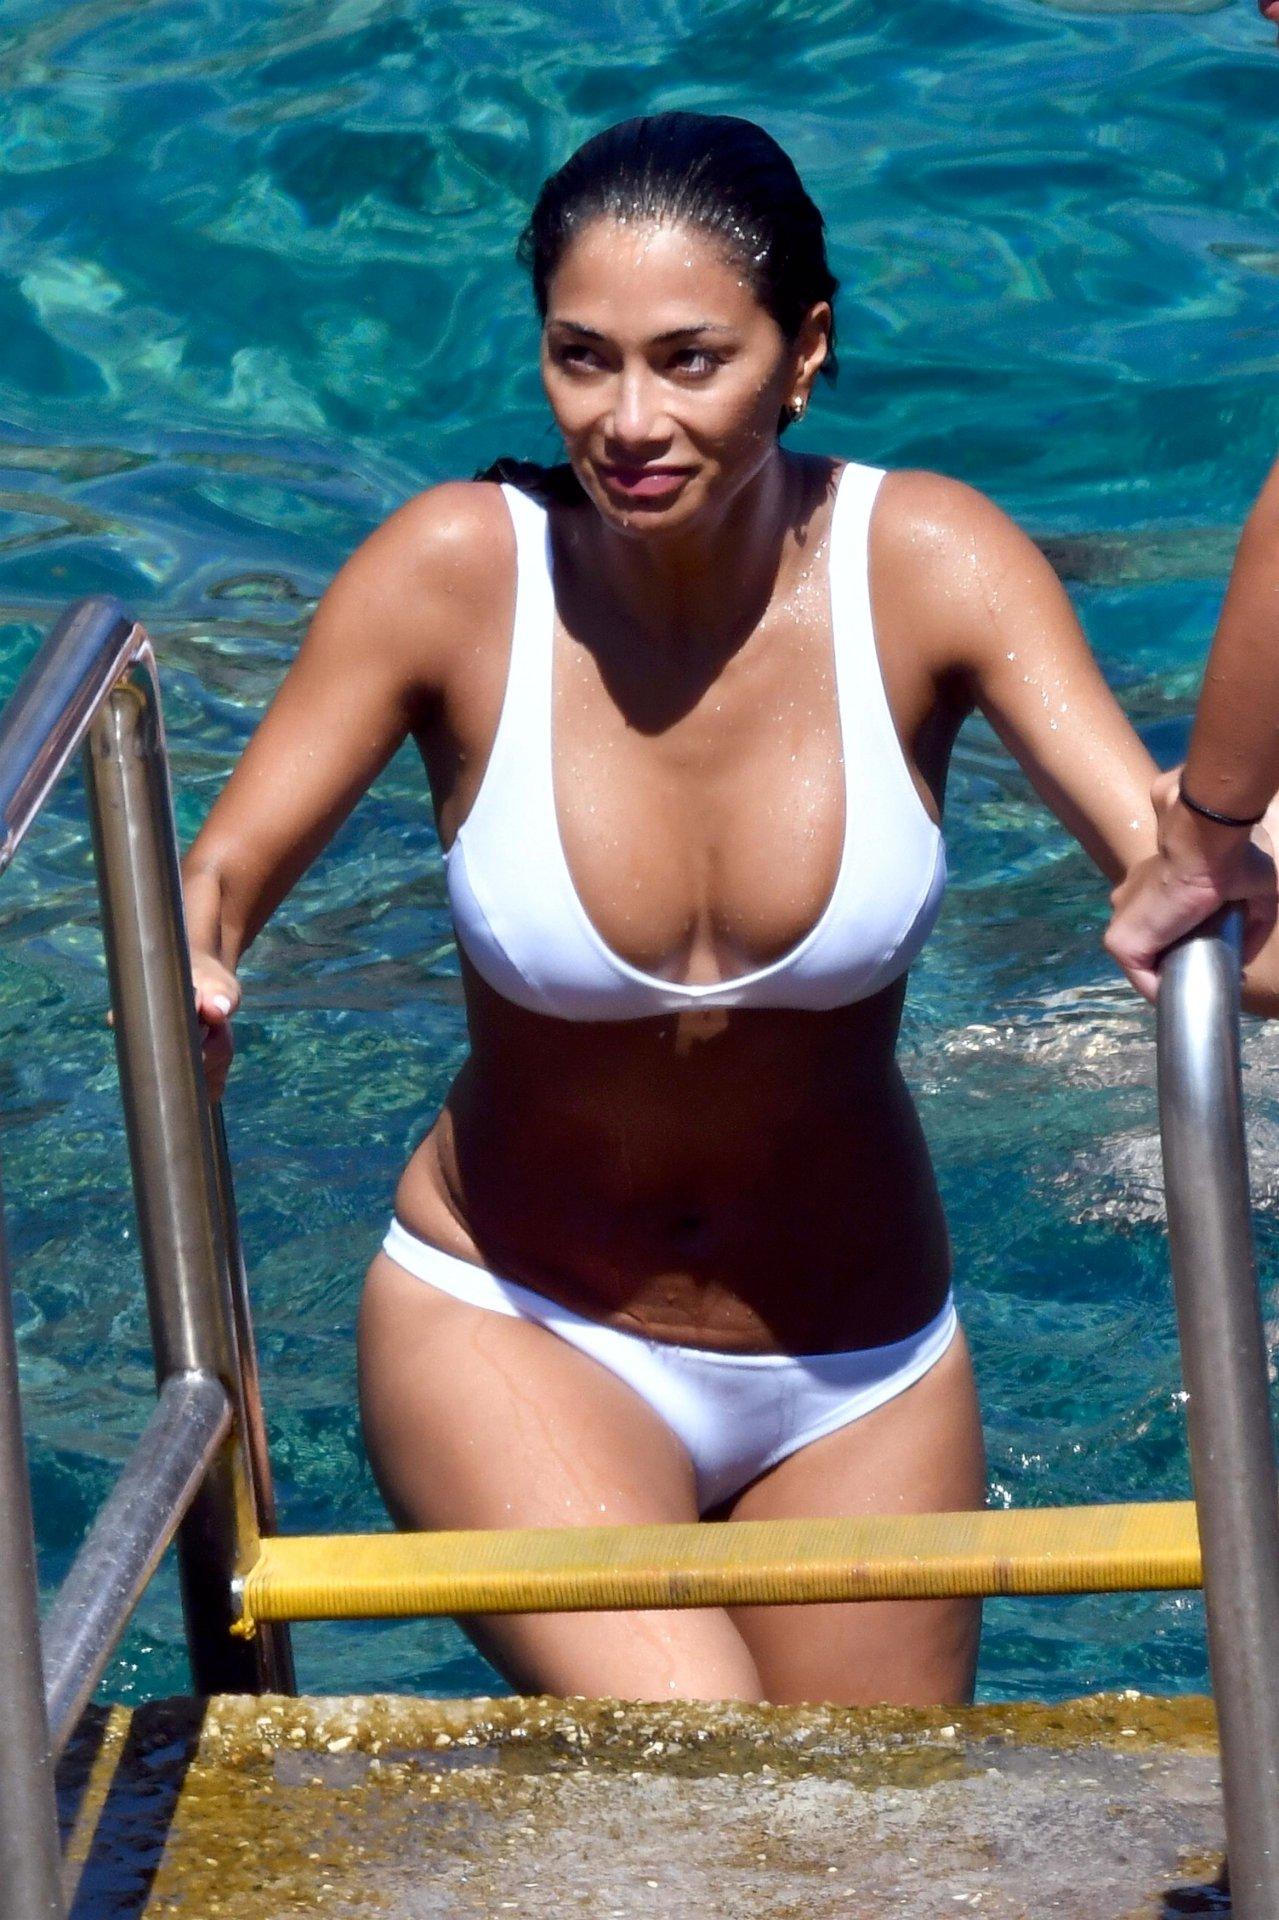 Nicole Scherzinger Bikini | Hot Celebs Home Nicole Scherzinger Instagram